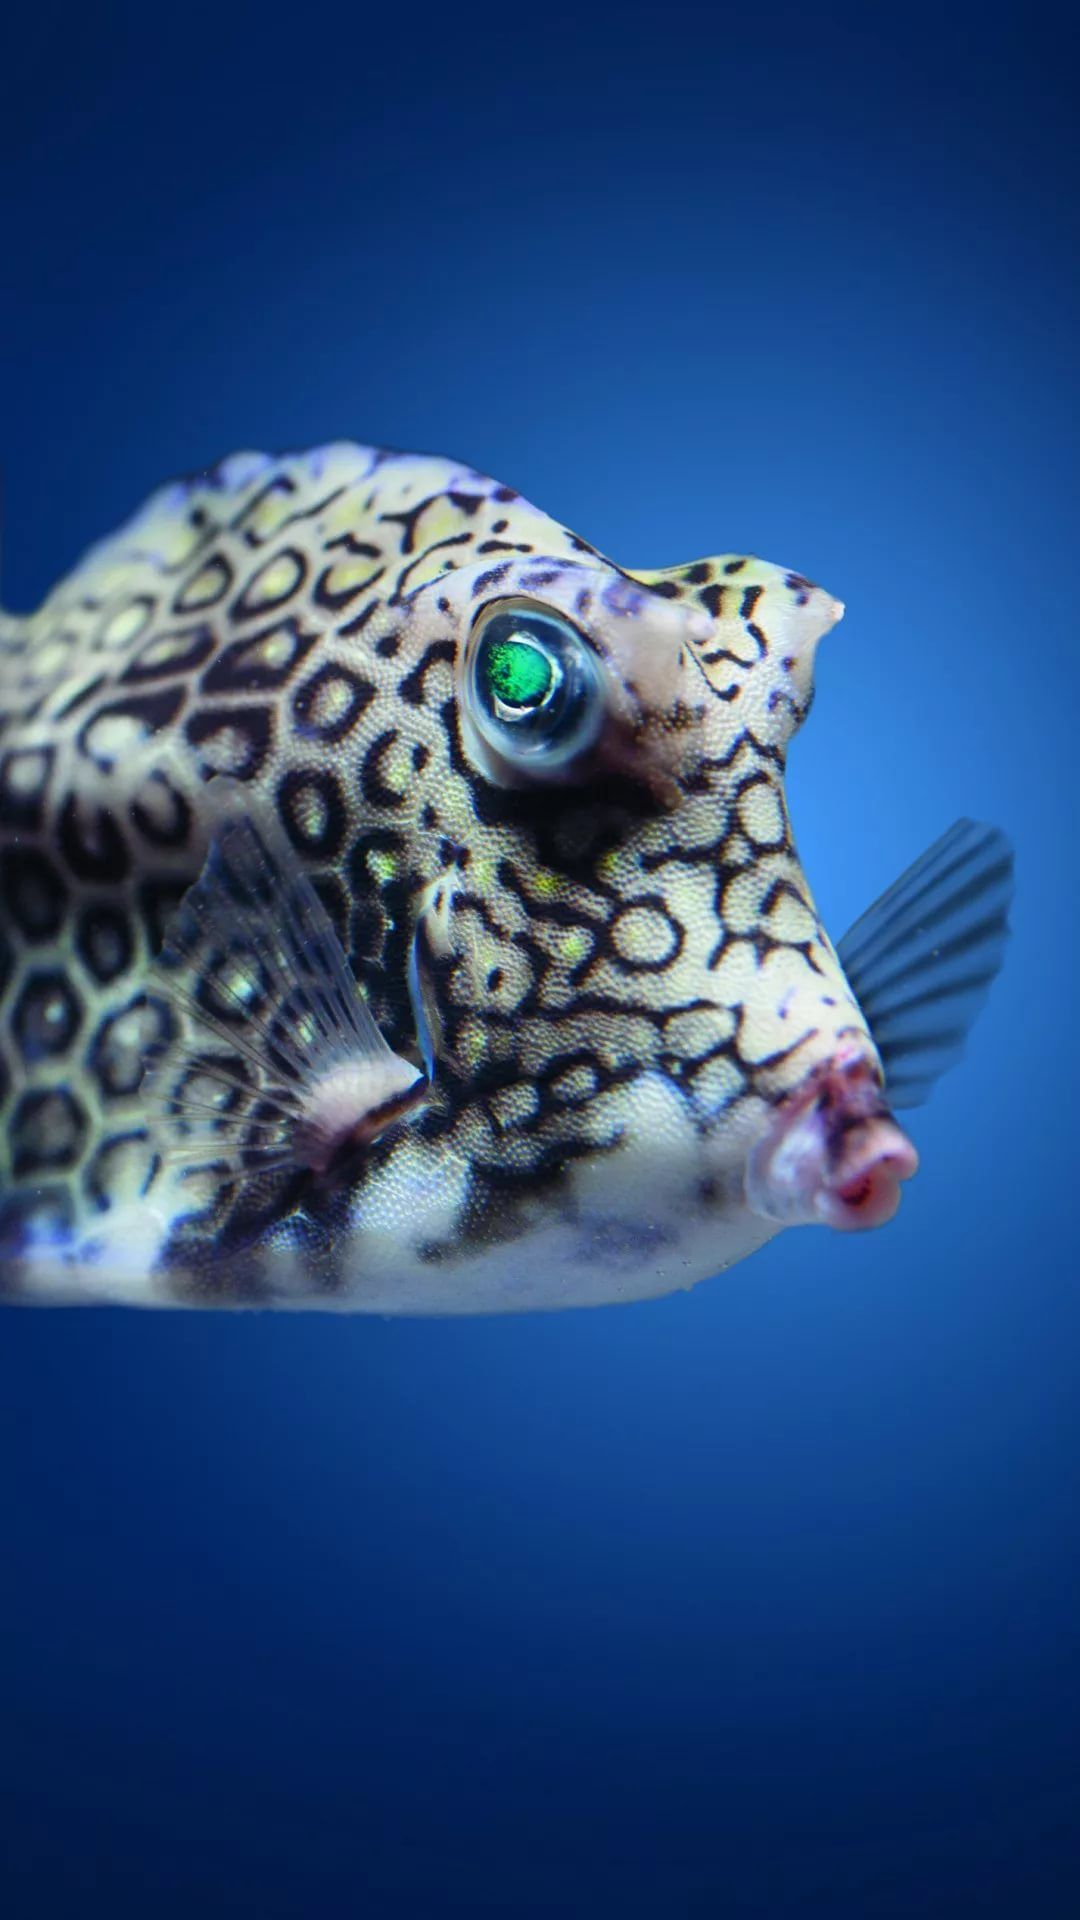 Fish good wallpaper for iPhone